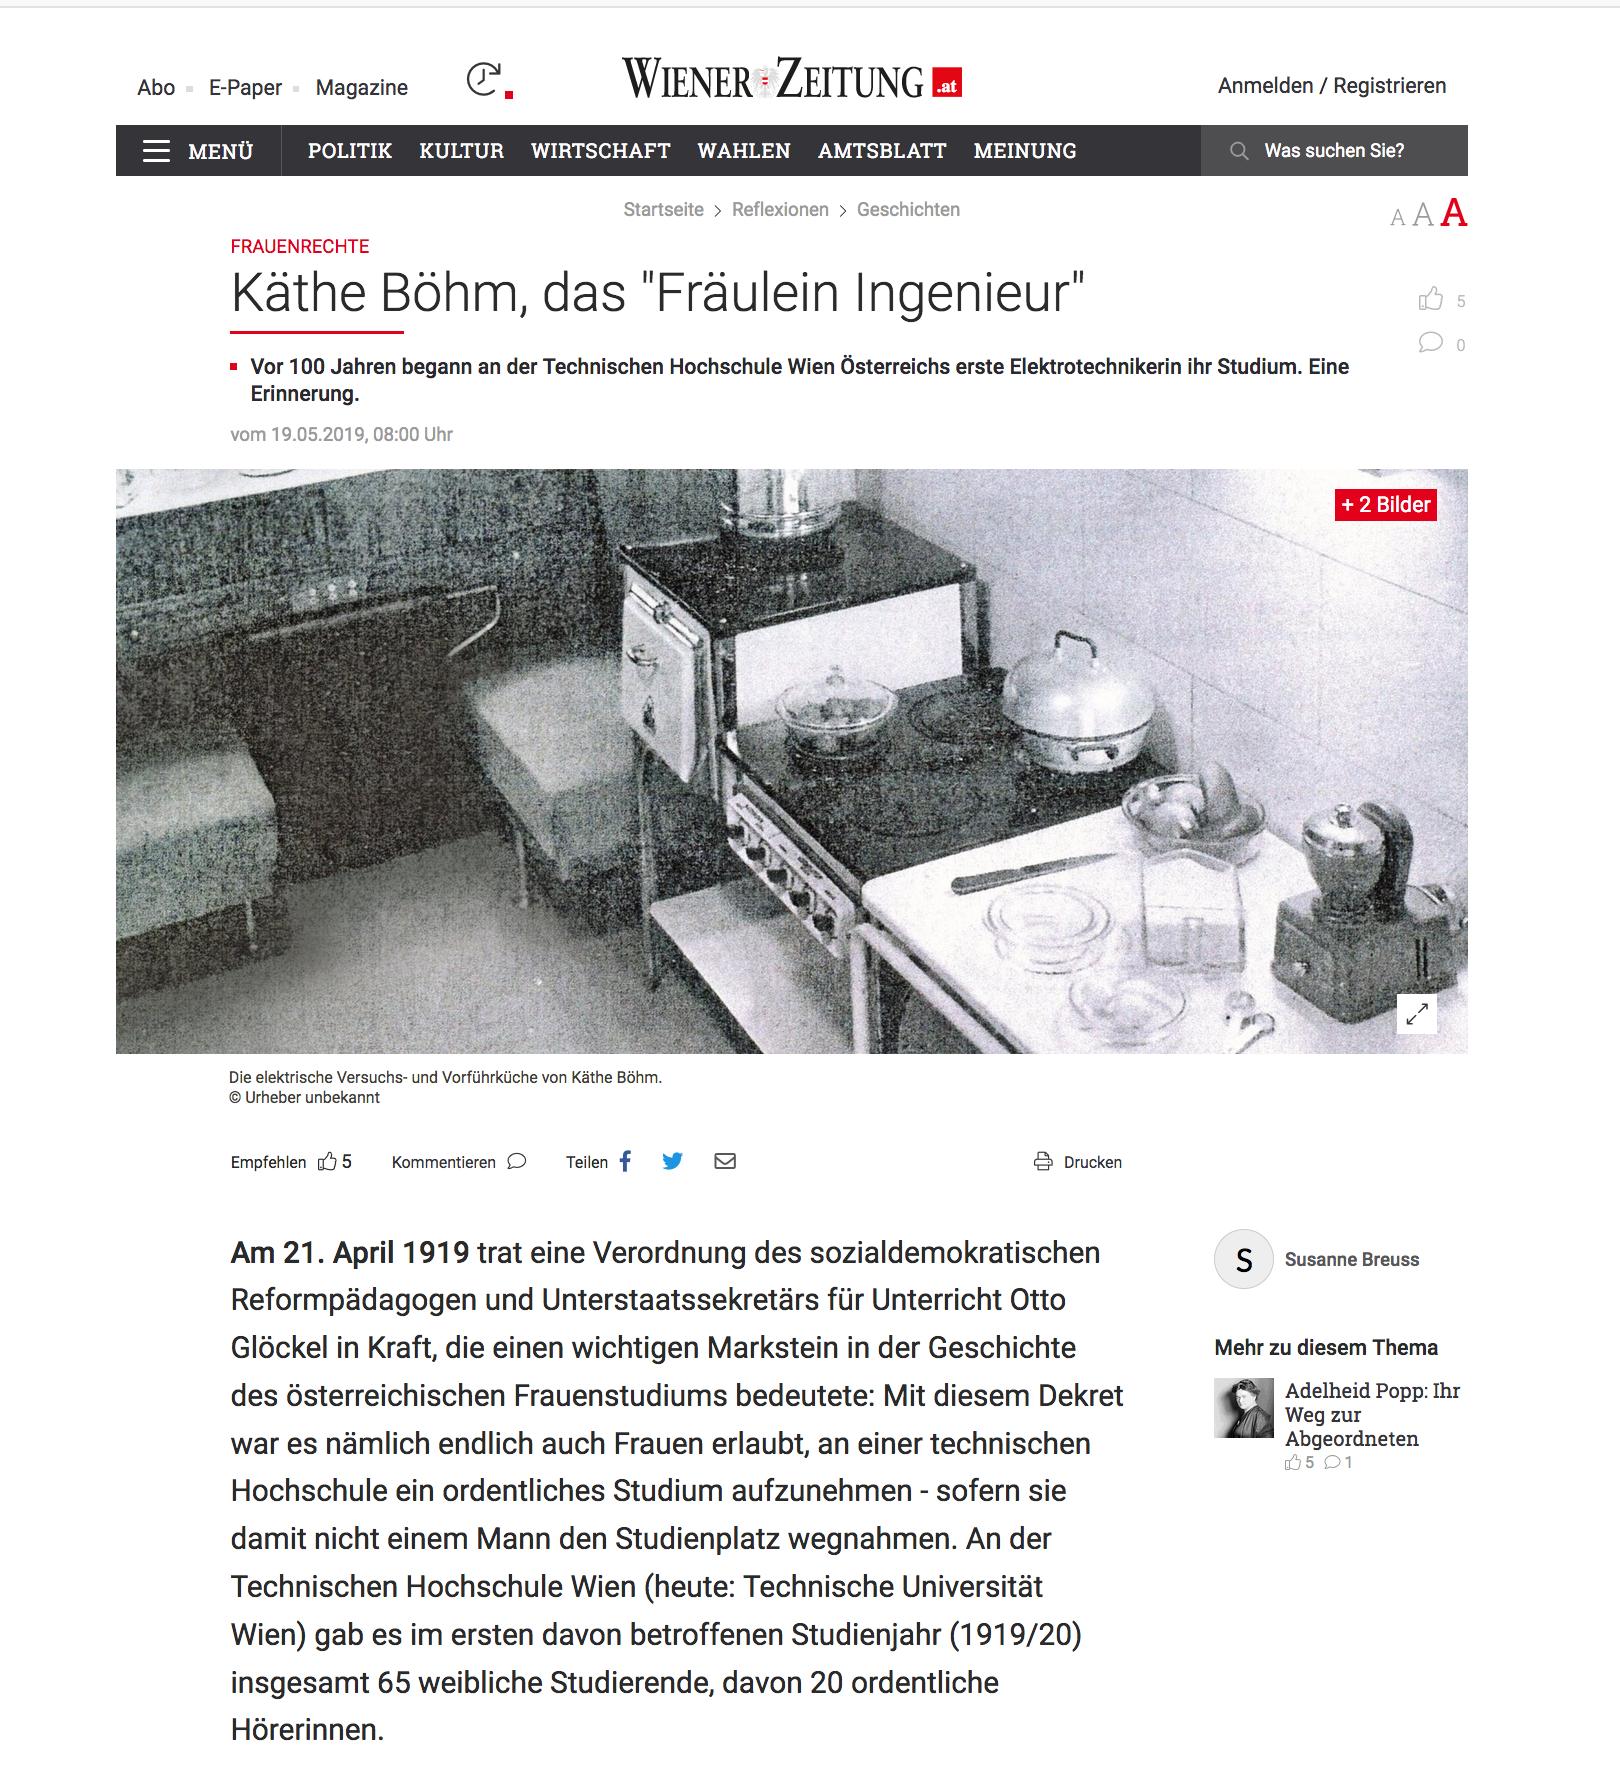 TU Wien Technikstudium Frauen Wiener Zeitung